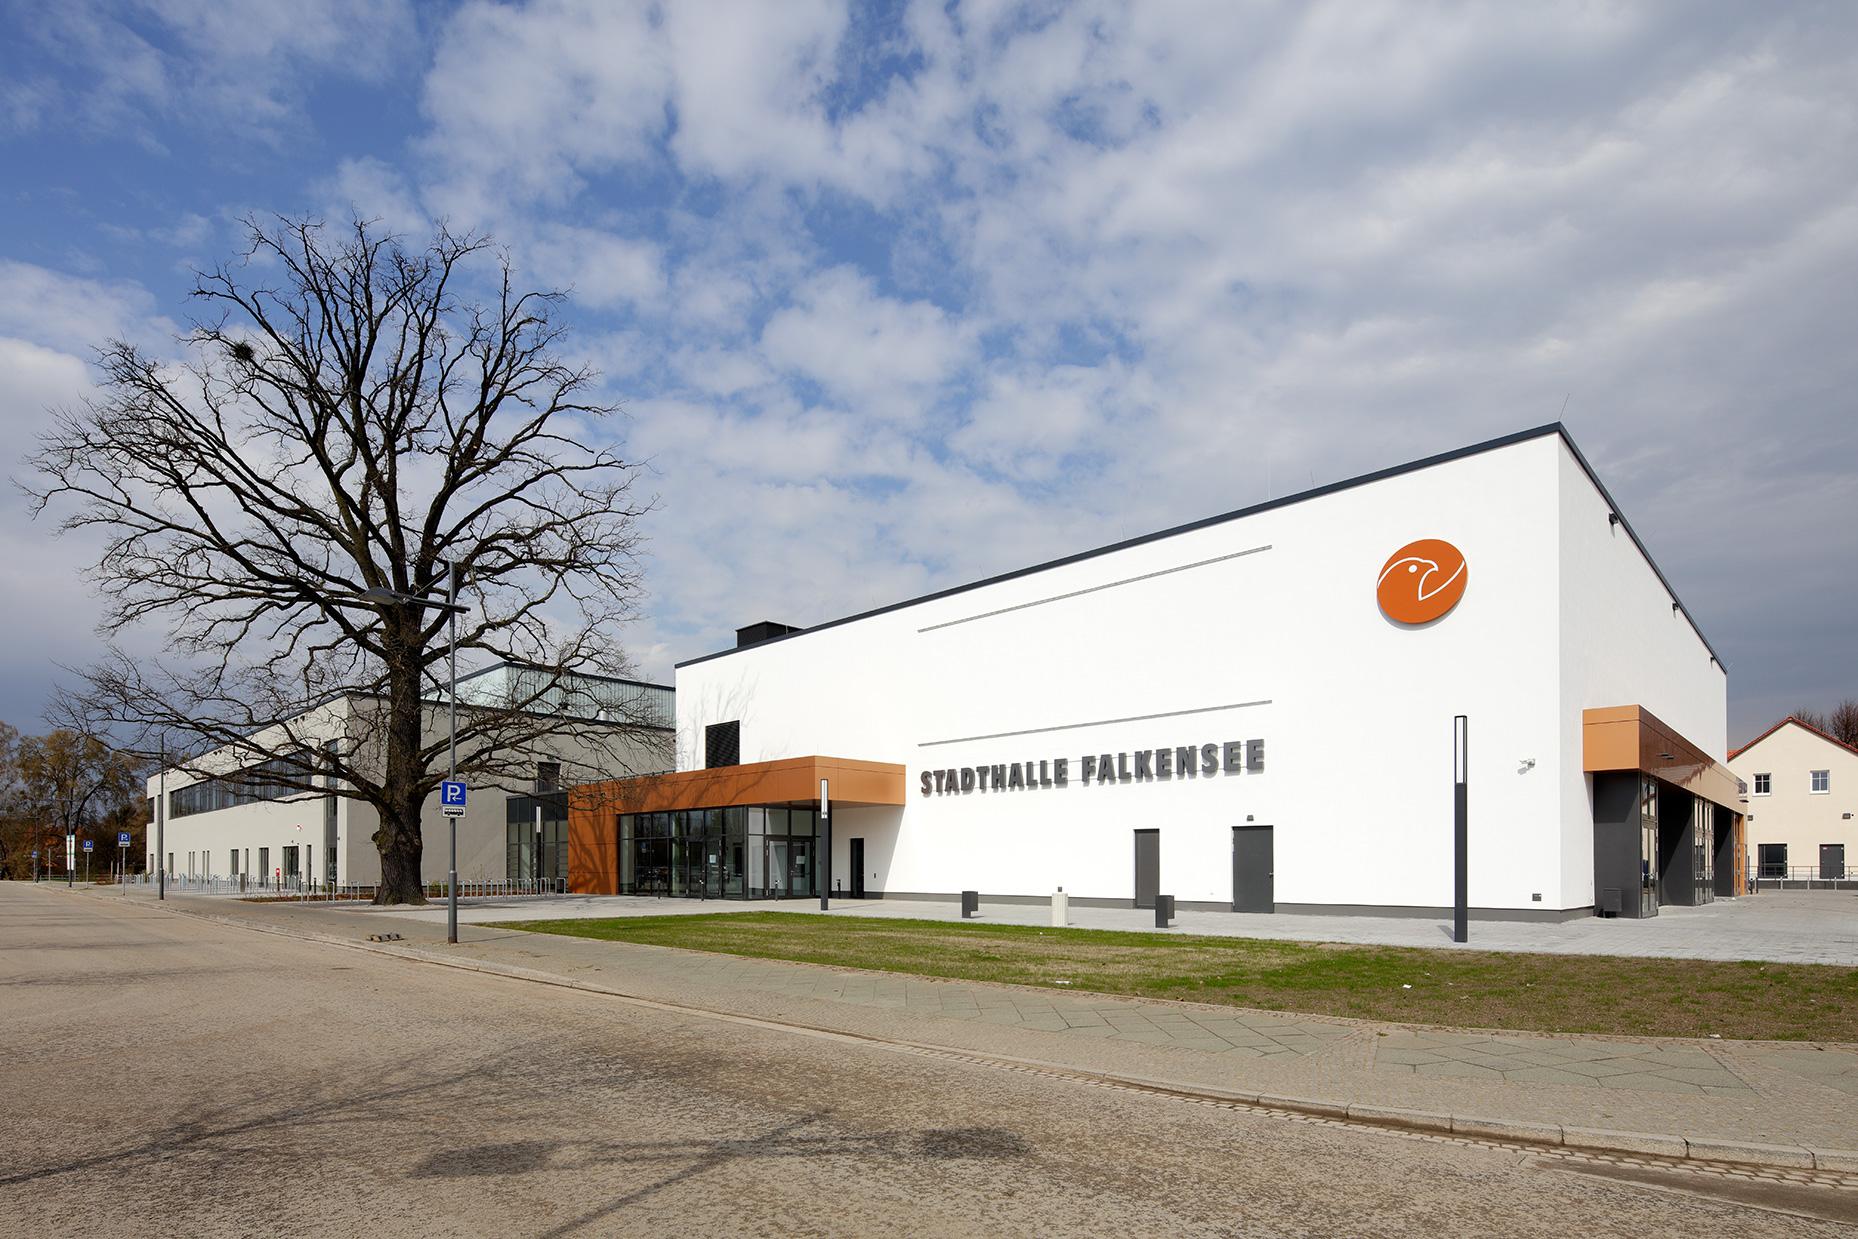 Stadthalle Falkensee